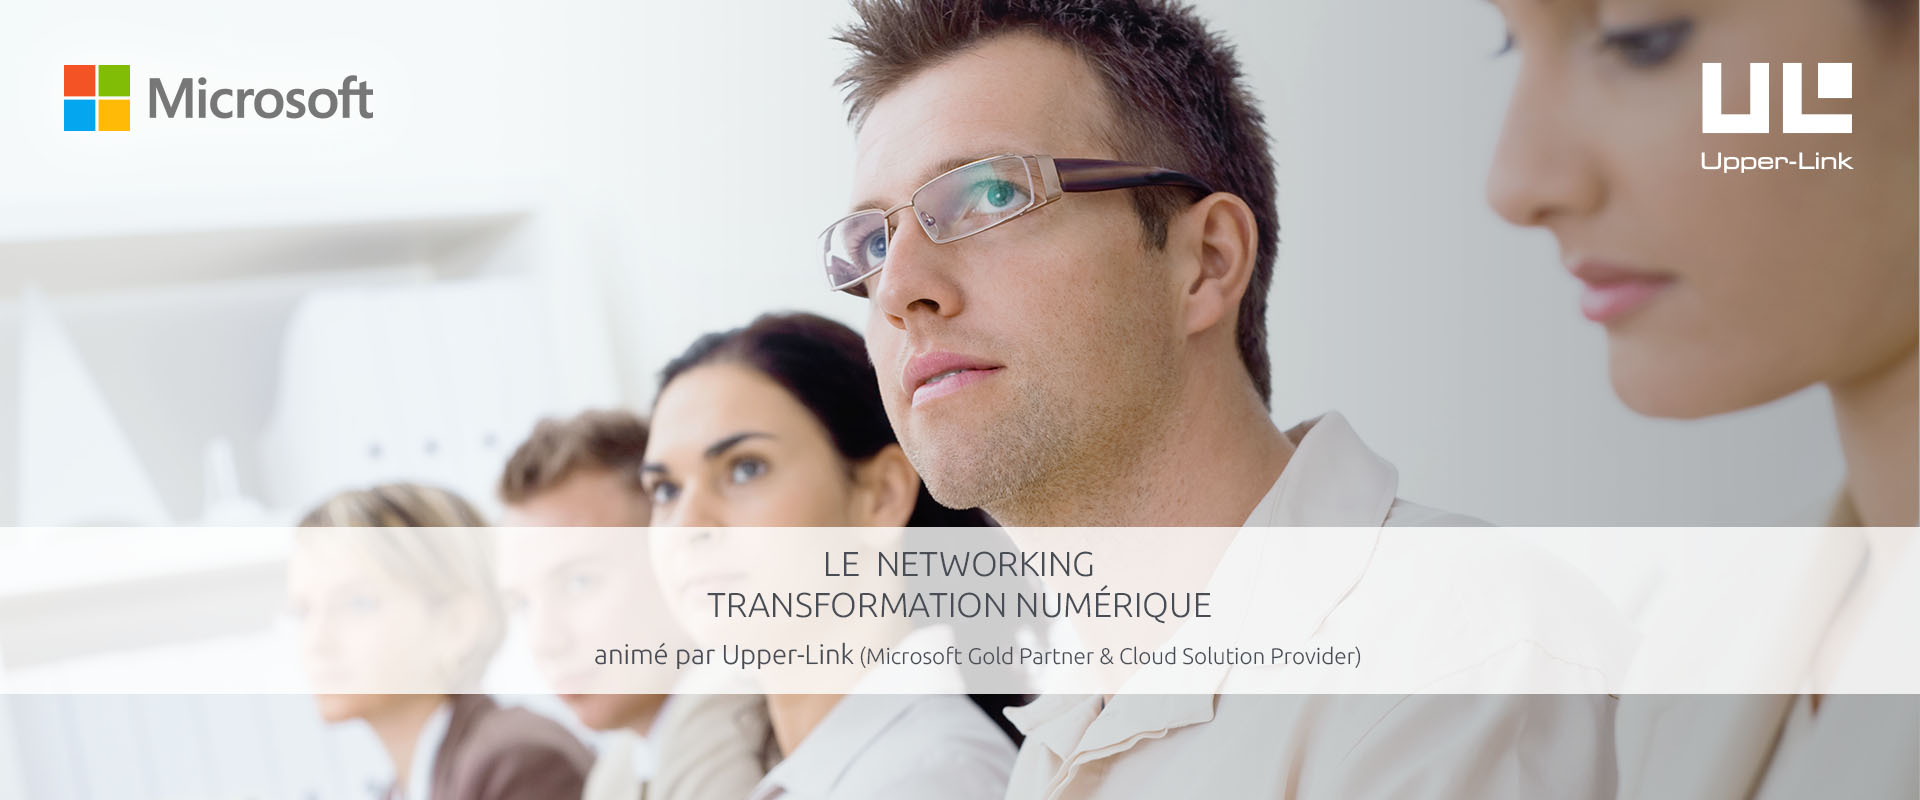 Header Rencontres UL - Azure - Mailing.jpg